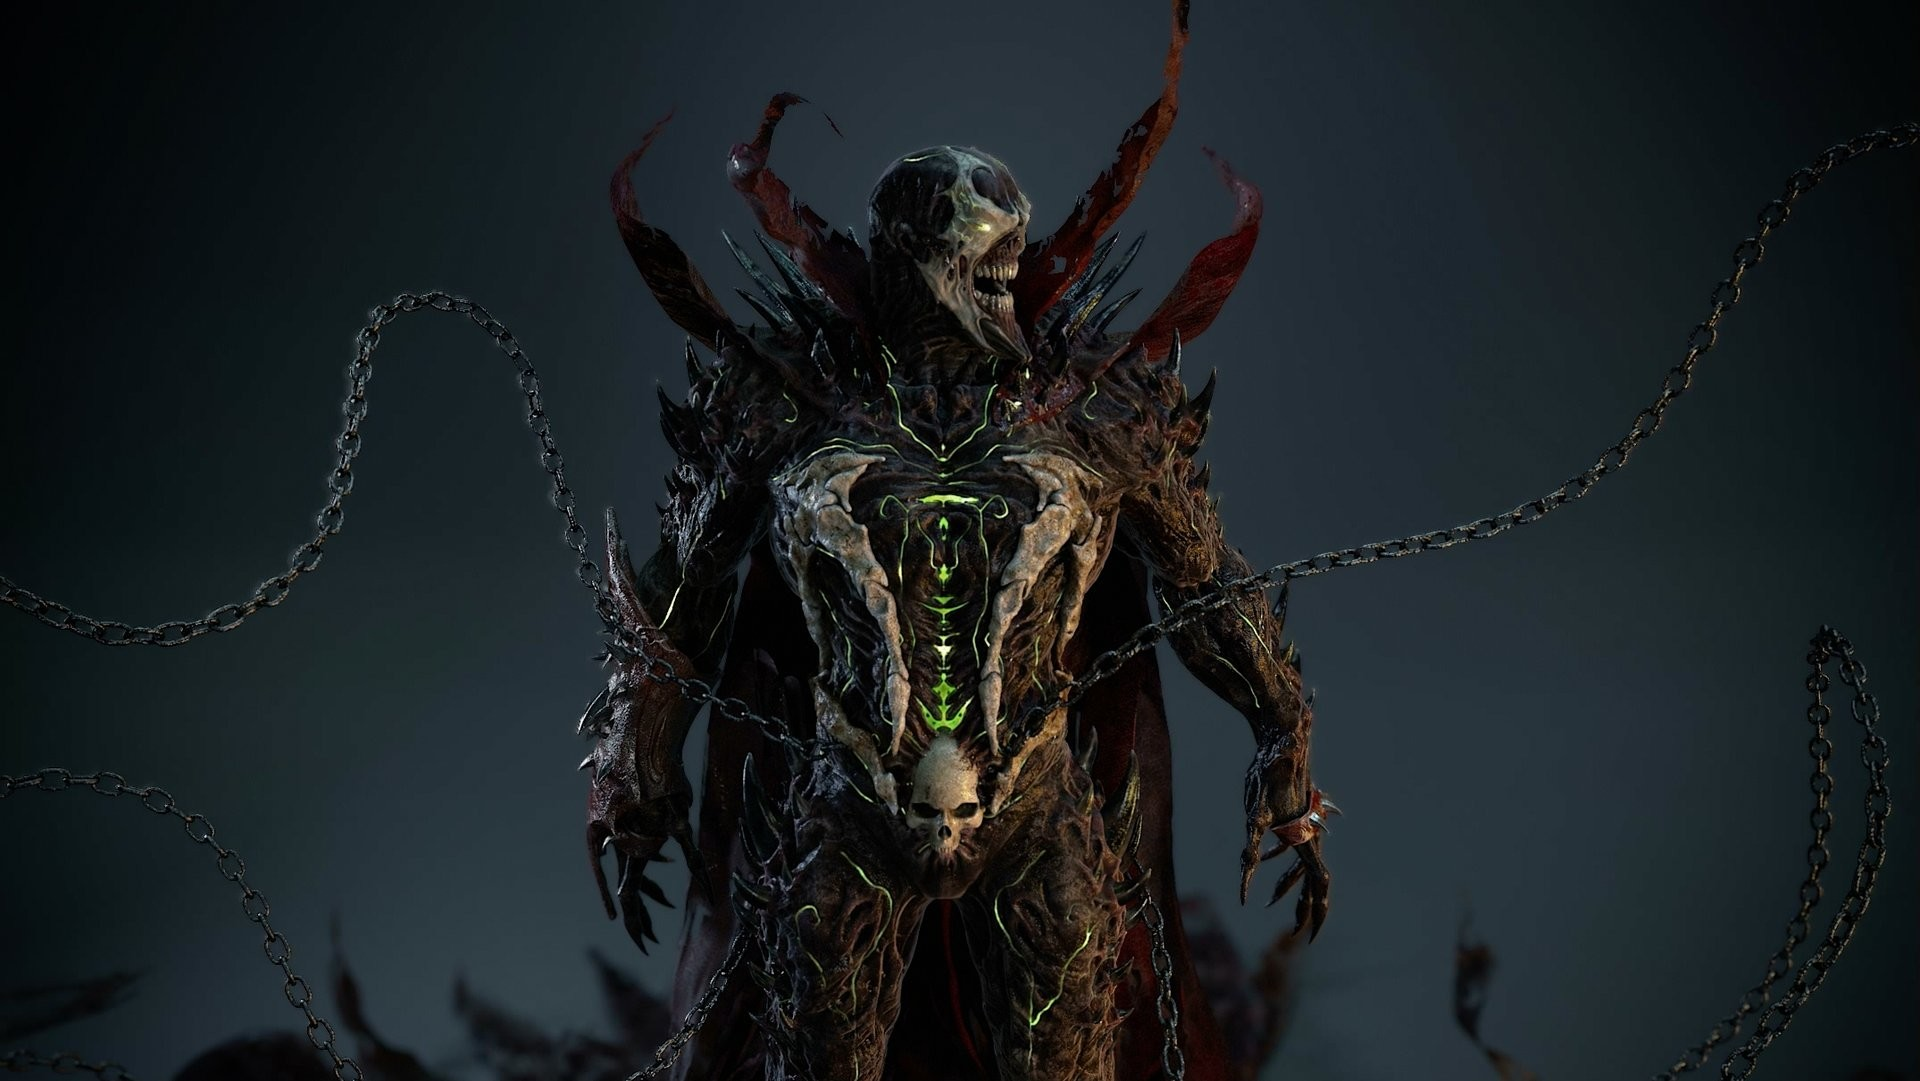 Nightmarish SPAWN 3D Art Design by Atilla Ceylan